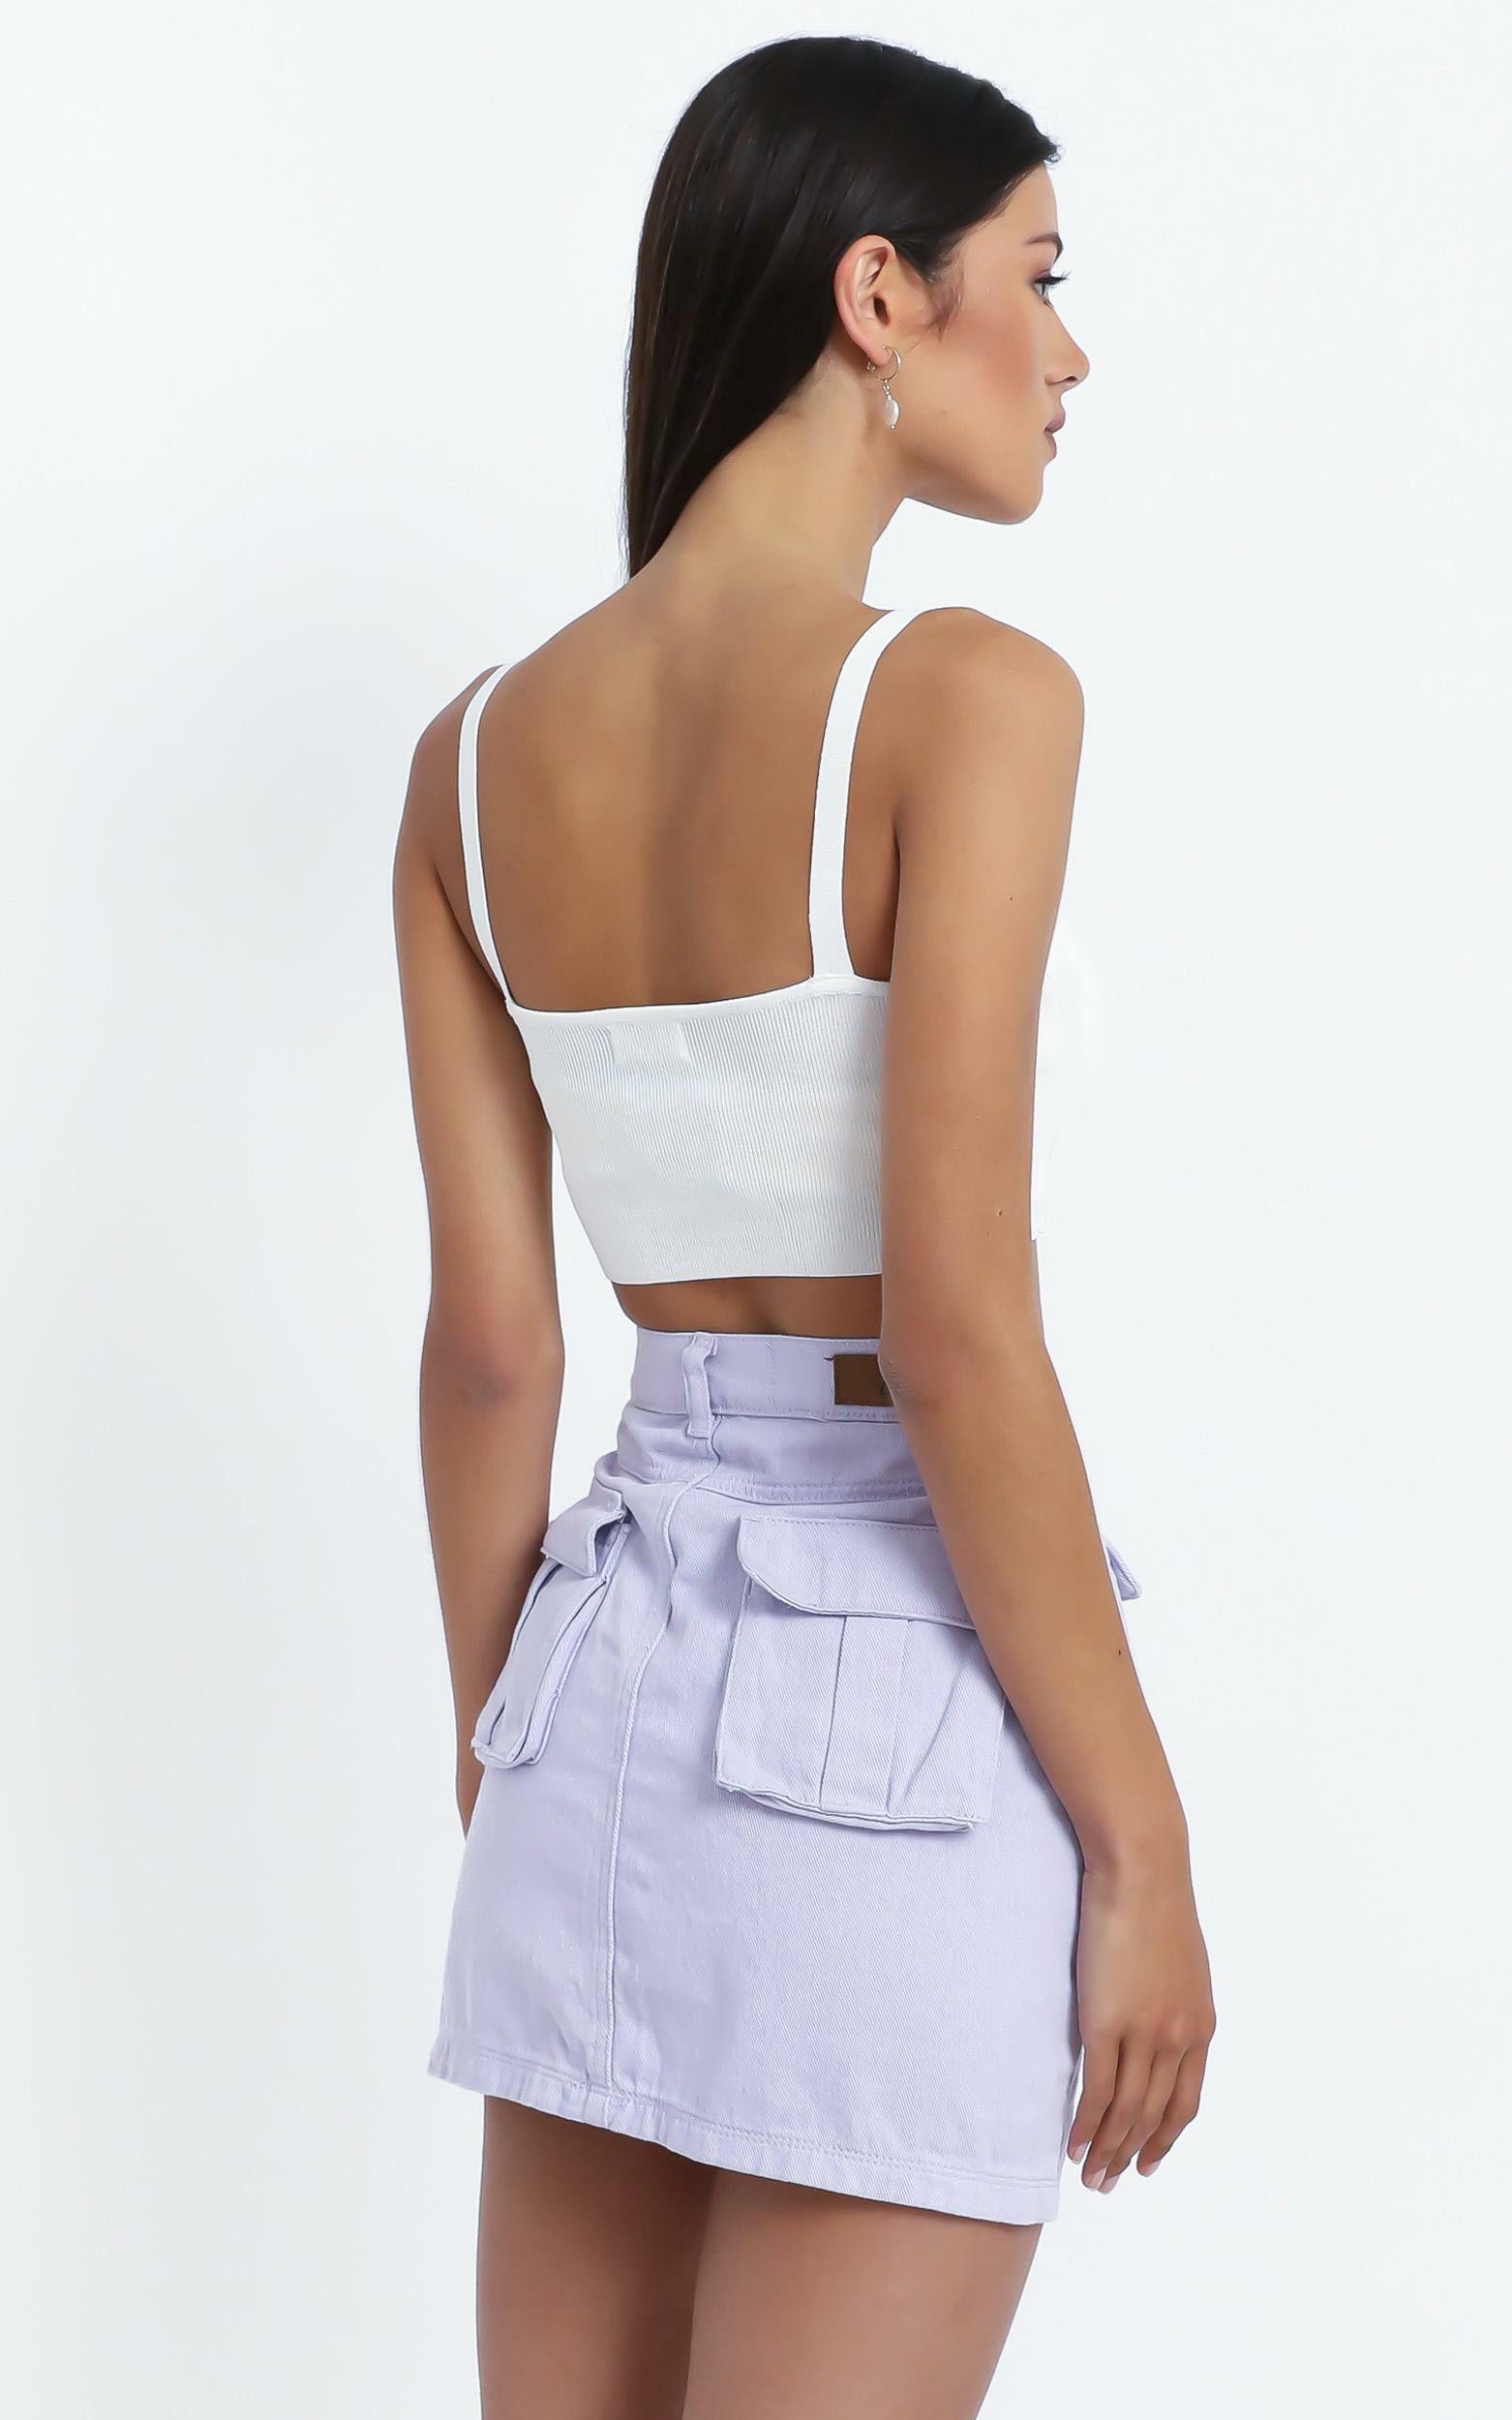 Mendez Skirt in Lilac - 14 (XL), PRP3, hi-res image number null